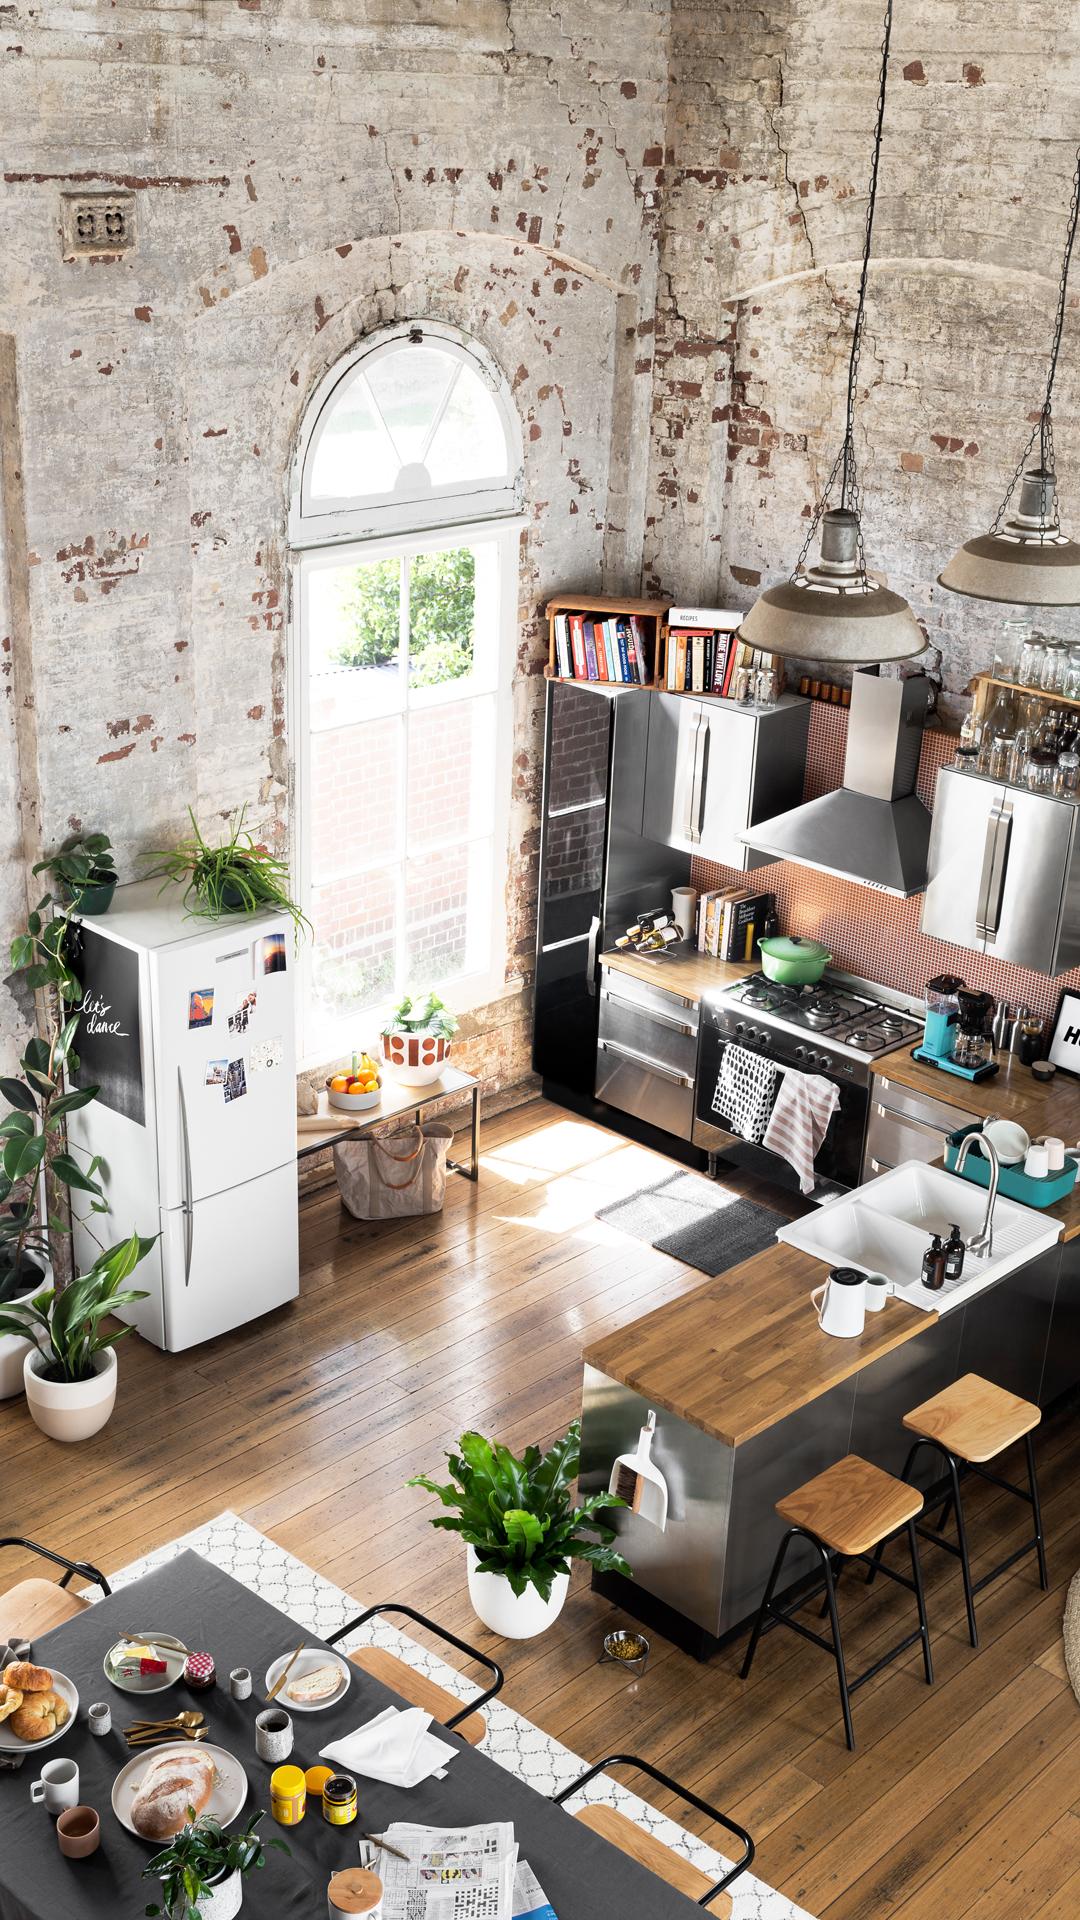 8 ideen f r mehr ordnung in der k che kreativliste. Black Bedroom Furniture Sets. Home Design Ideas